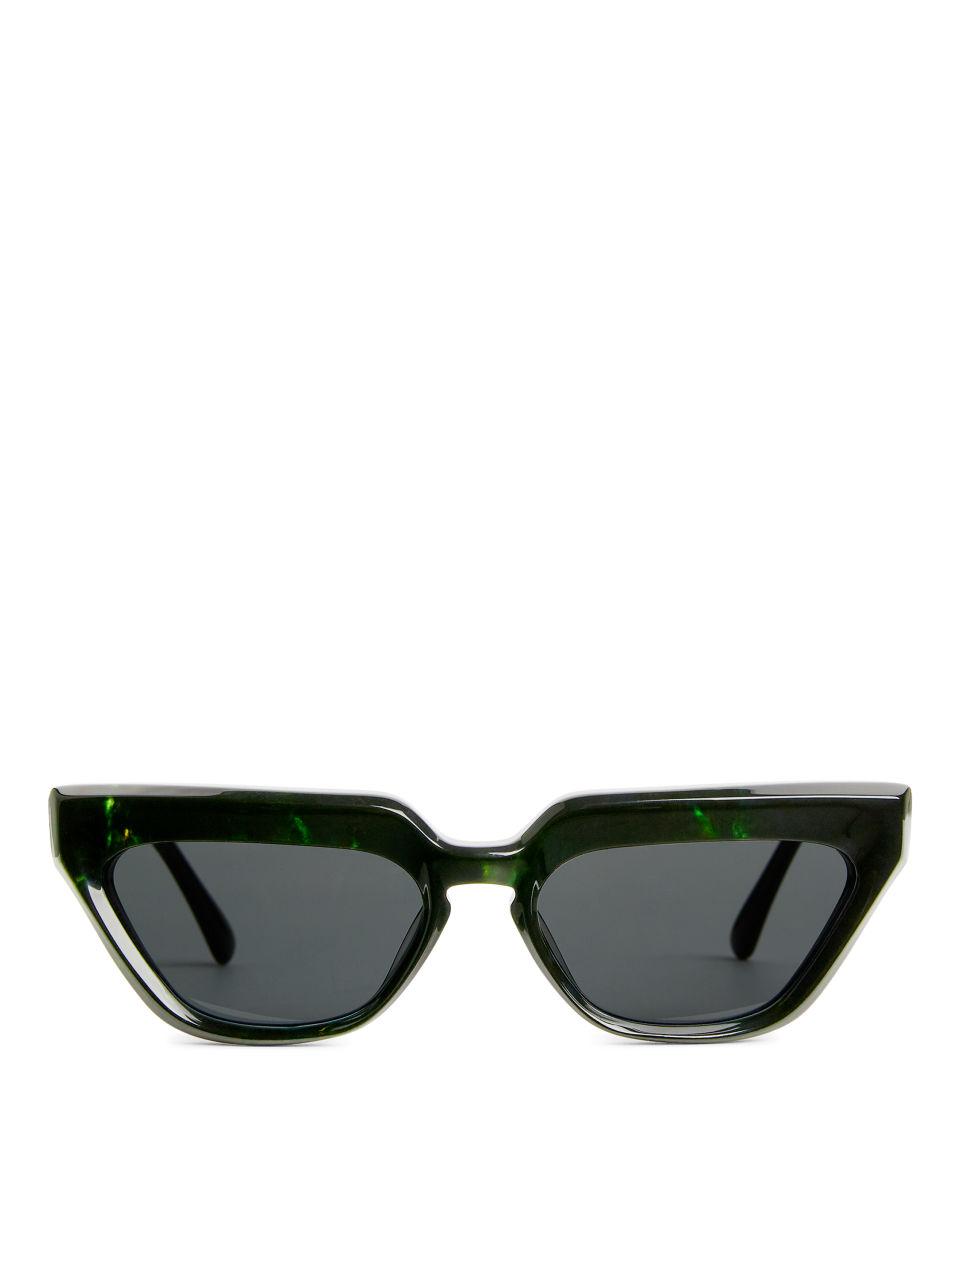 Cat-Eye Acetate Sunglasses - Black